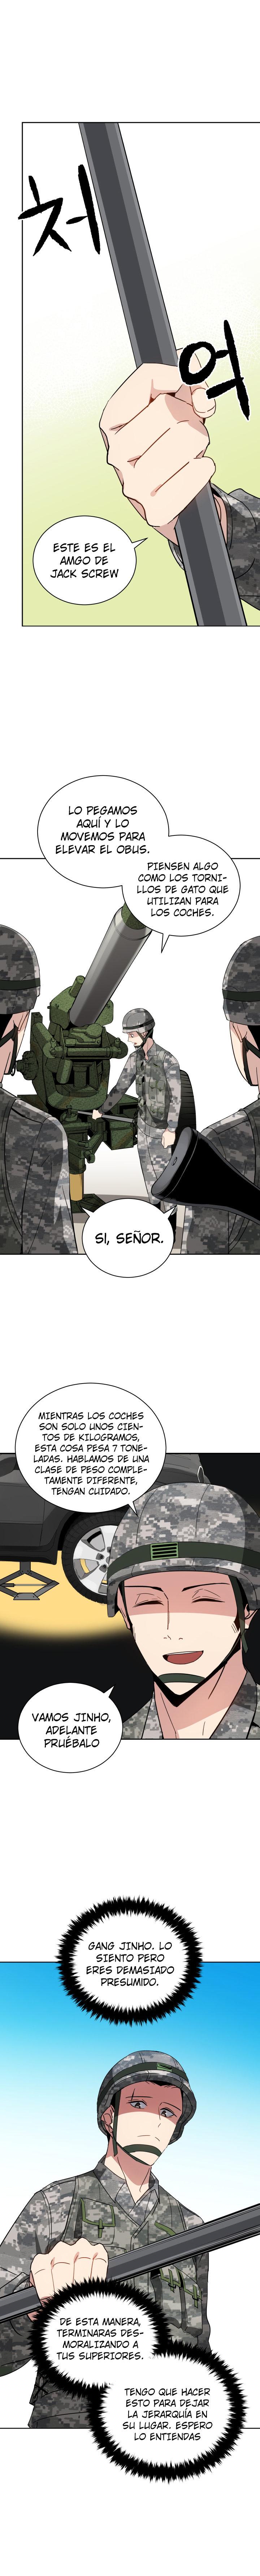 https://nine.mangadogs.com/es_manga/pic8/53/35509/940792/8c47f7c40acb430047f501a2d5345776.jpg Page 9